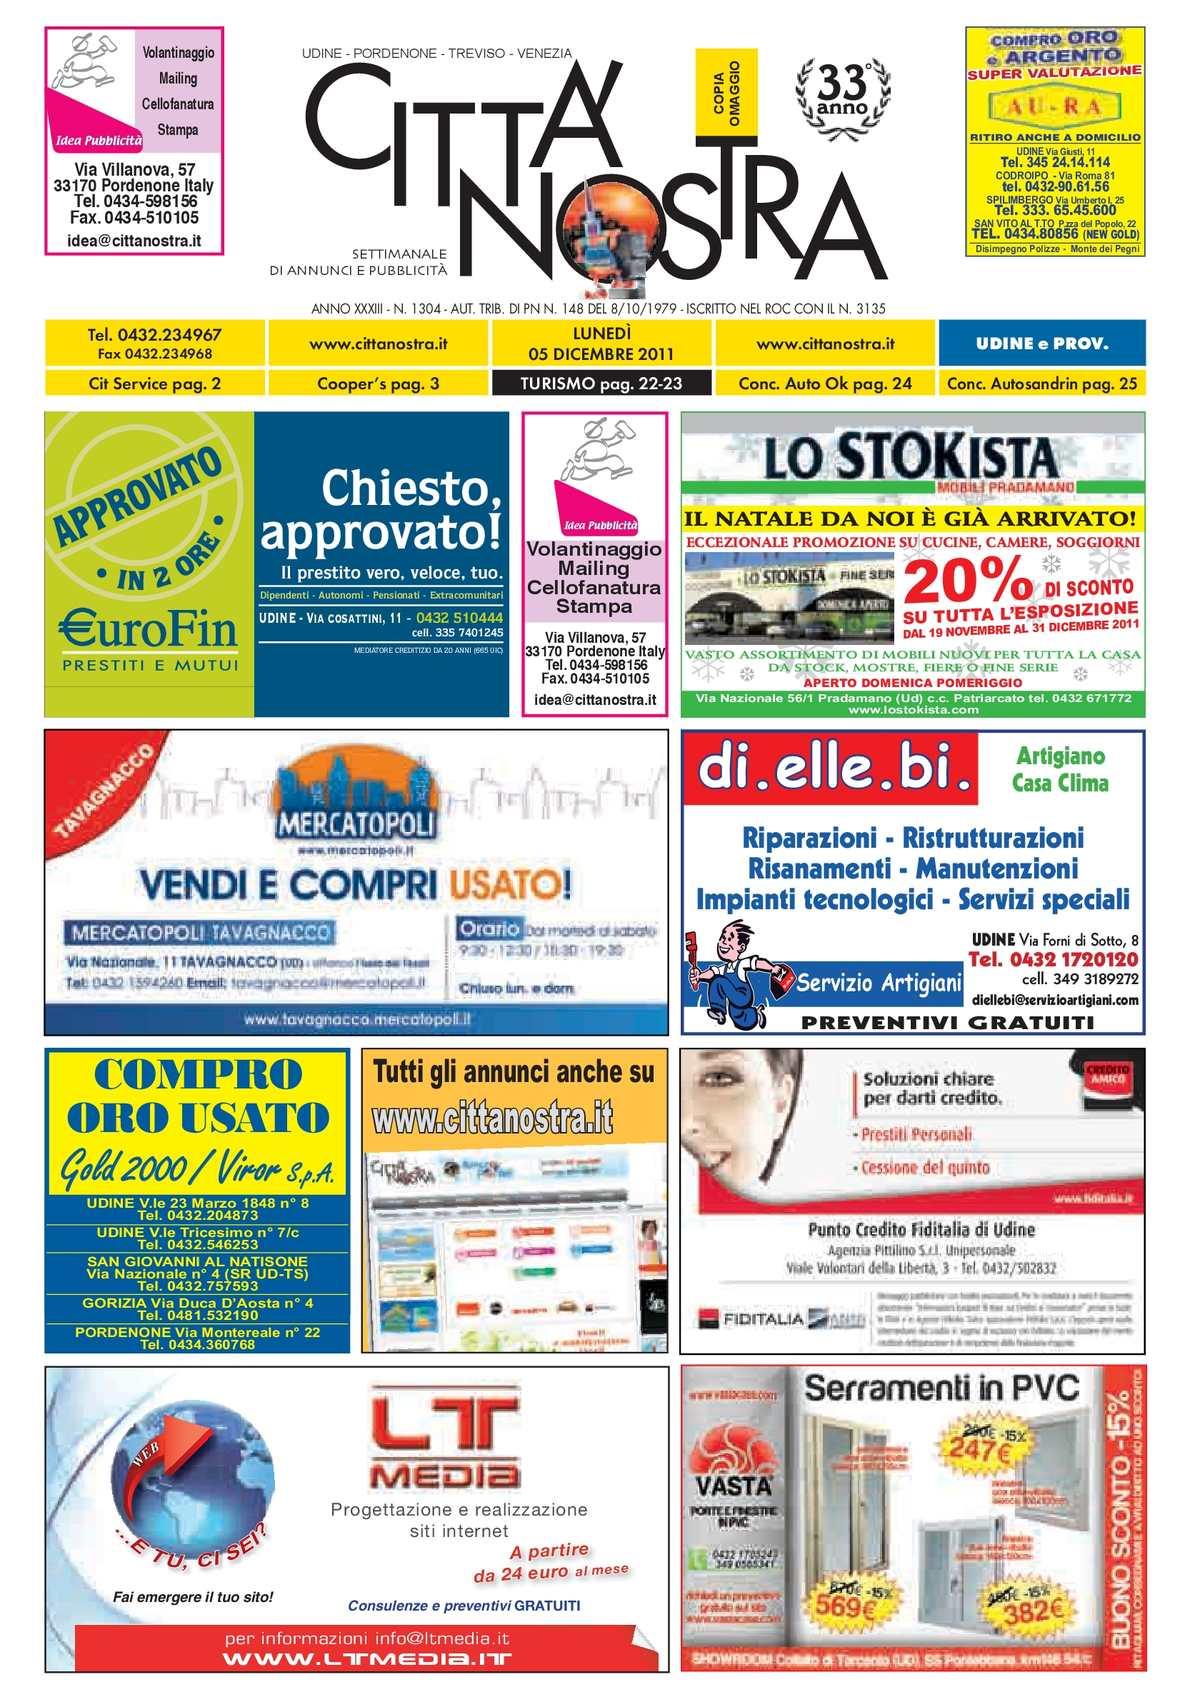 Calaméo Citt Nostra Udine Del 05 12 2011 N 1305